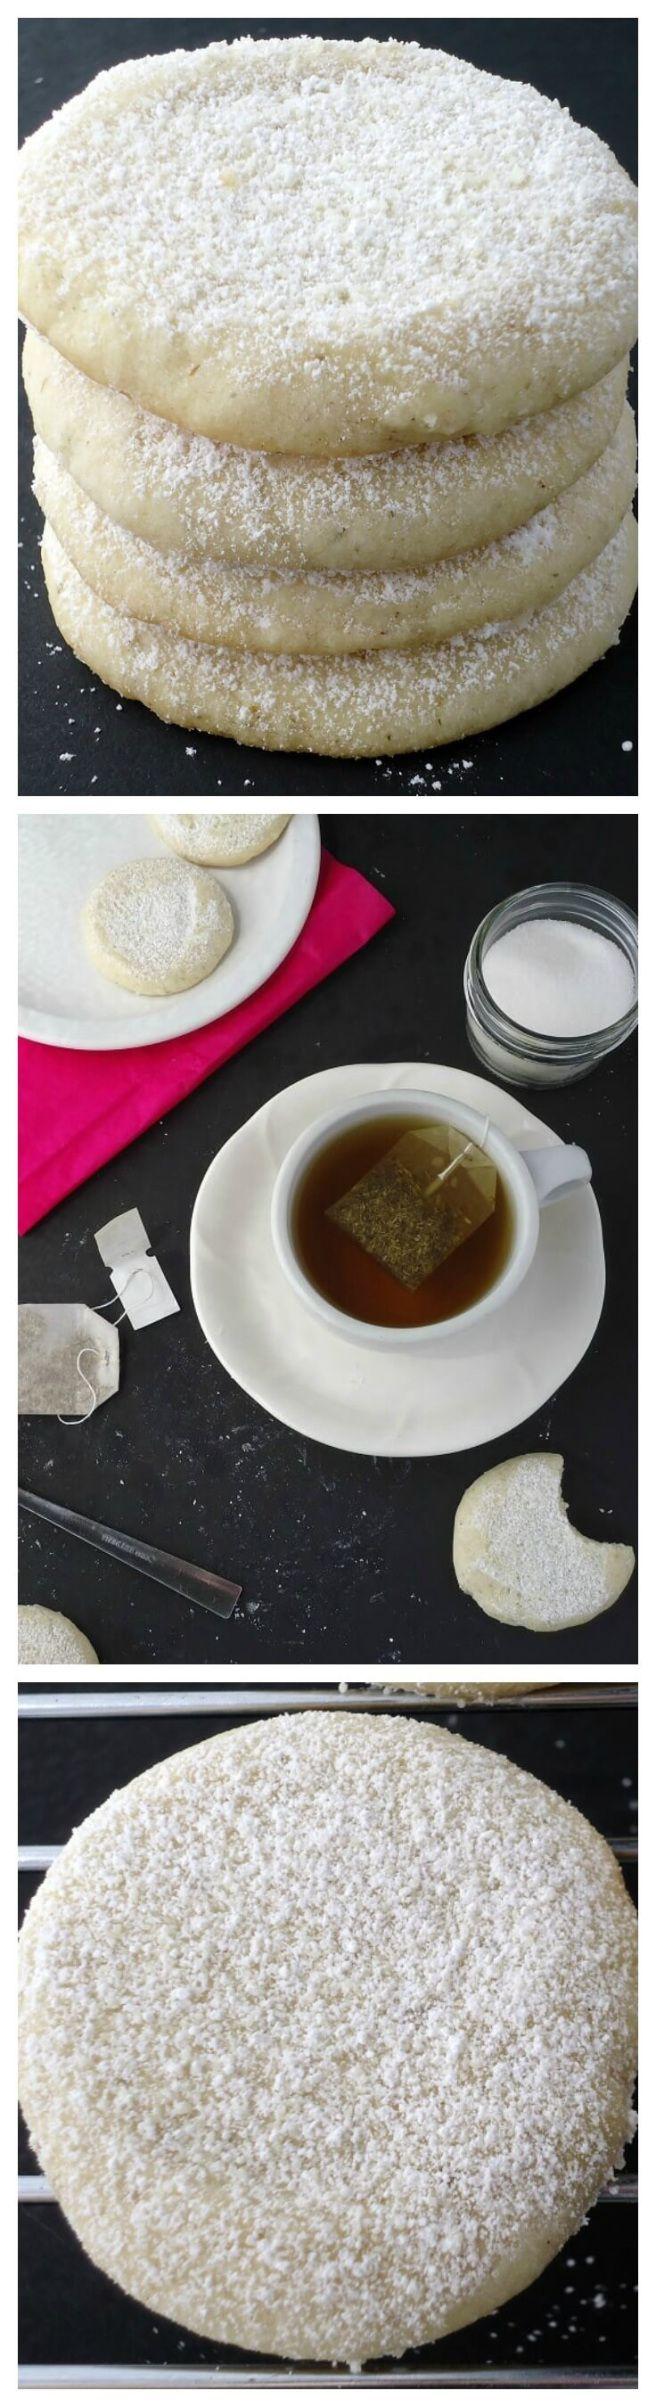 Tea infused cookies recipe